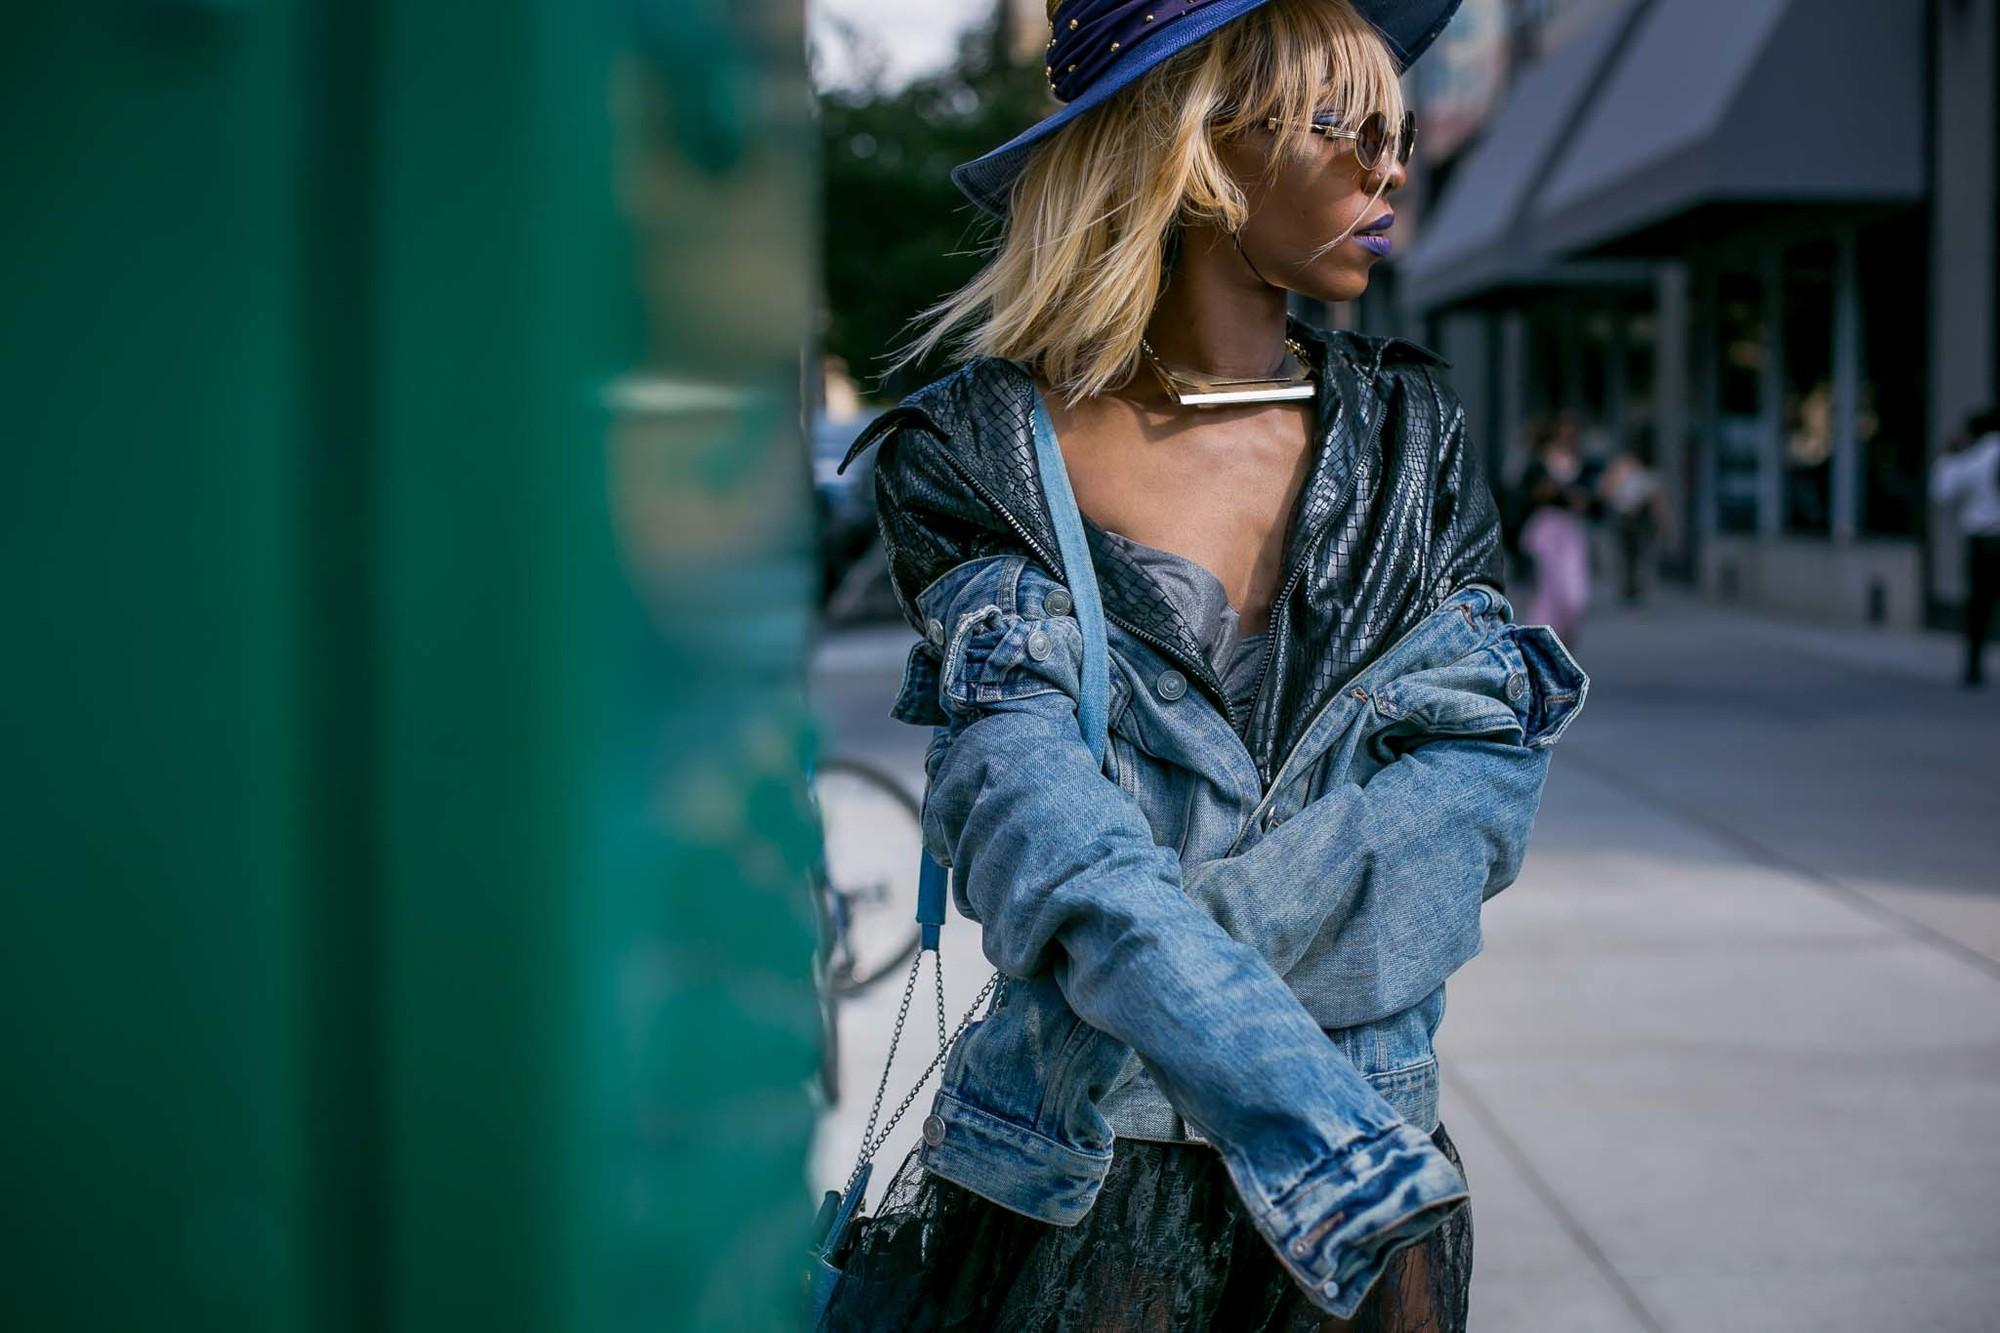 hair color for black women: blonde hair